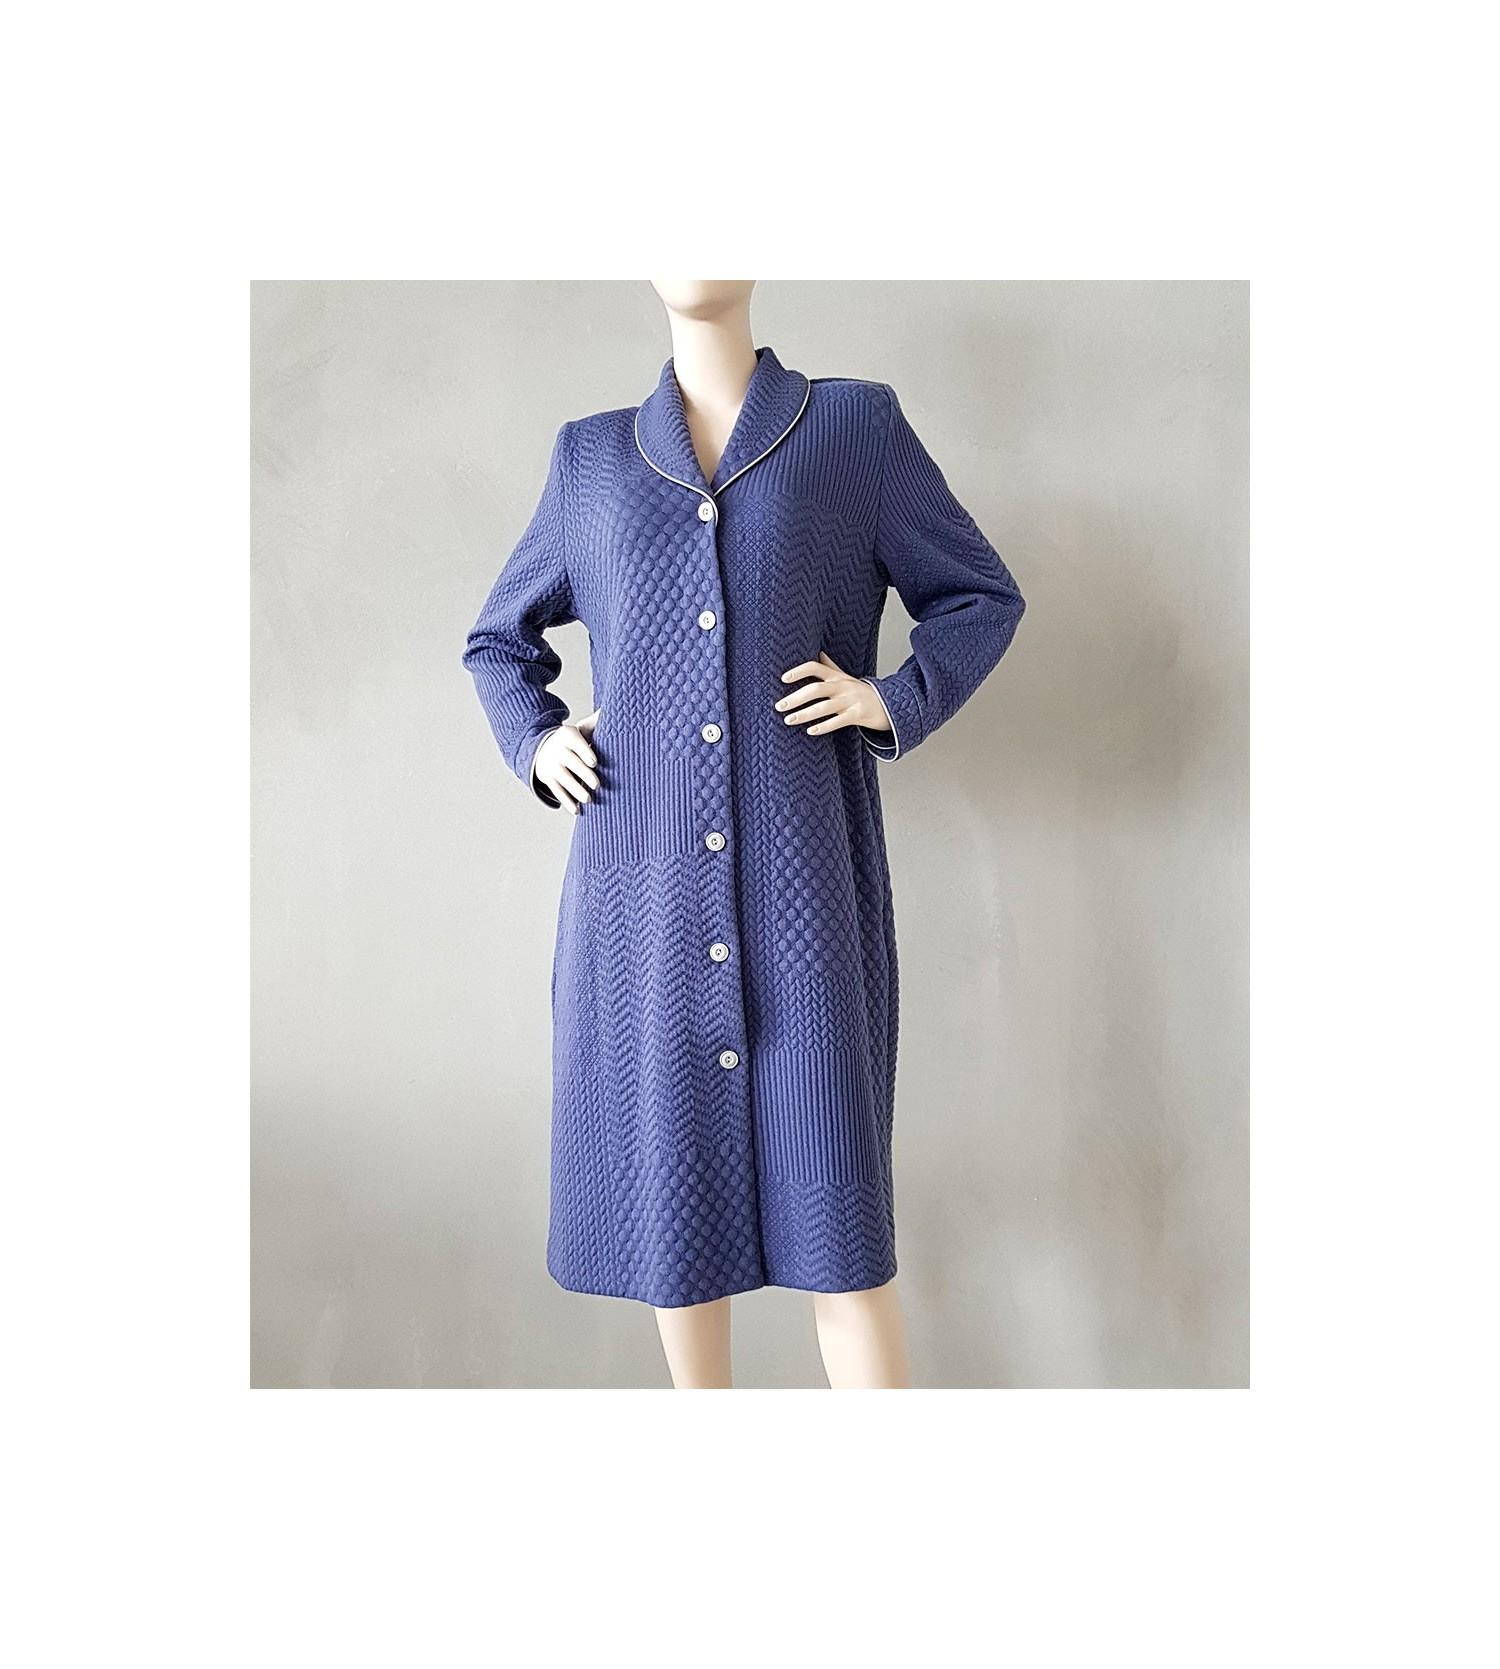 Robe de chambre boutonn e femme 3 bleu lingerie sipp - Robe de chambre canat femme ...